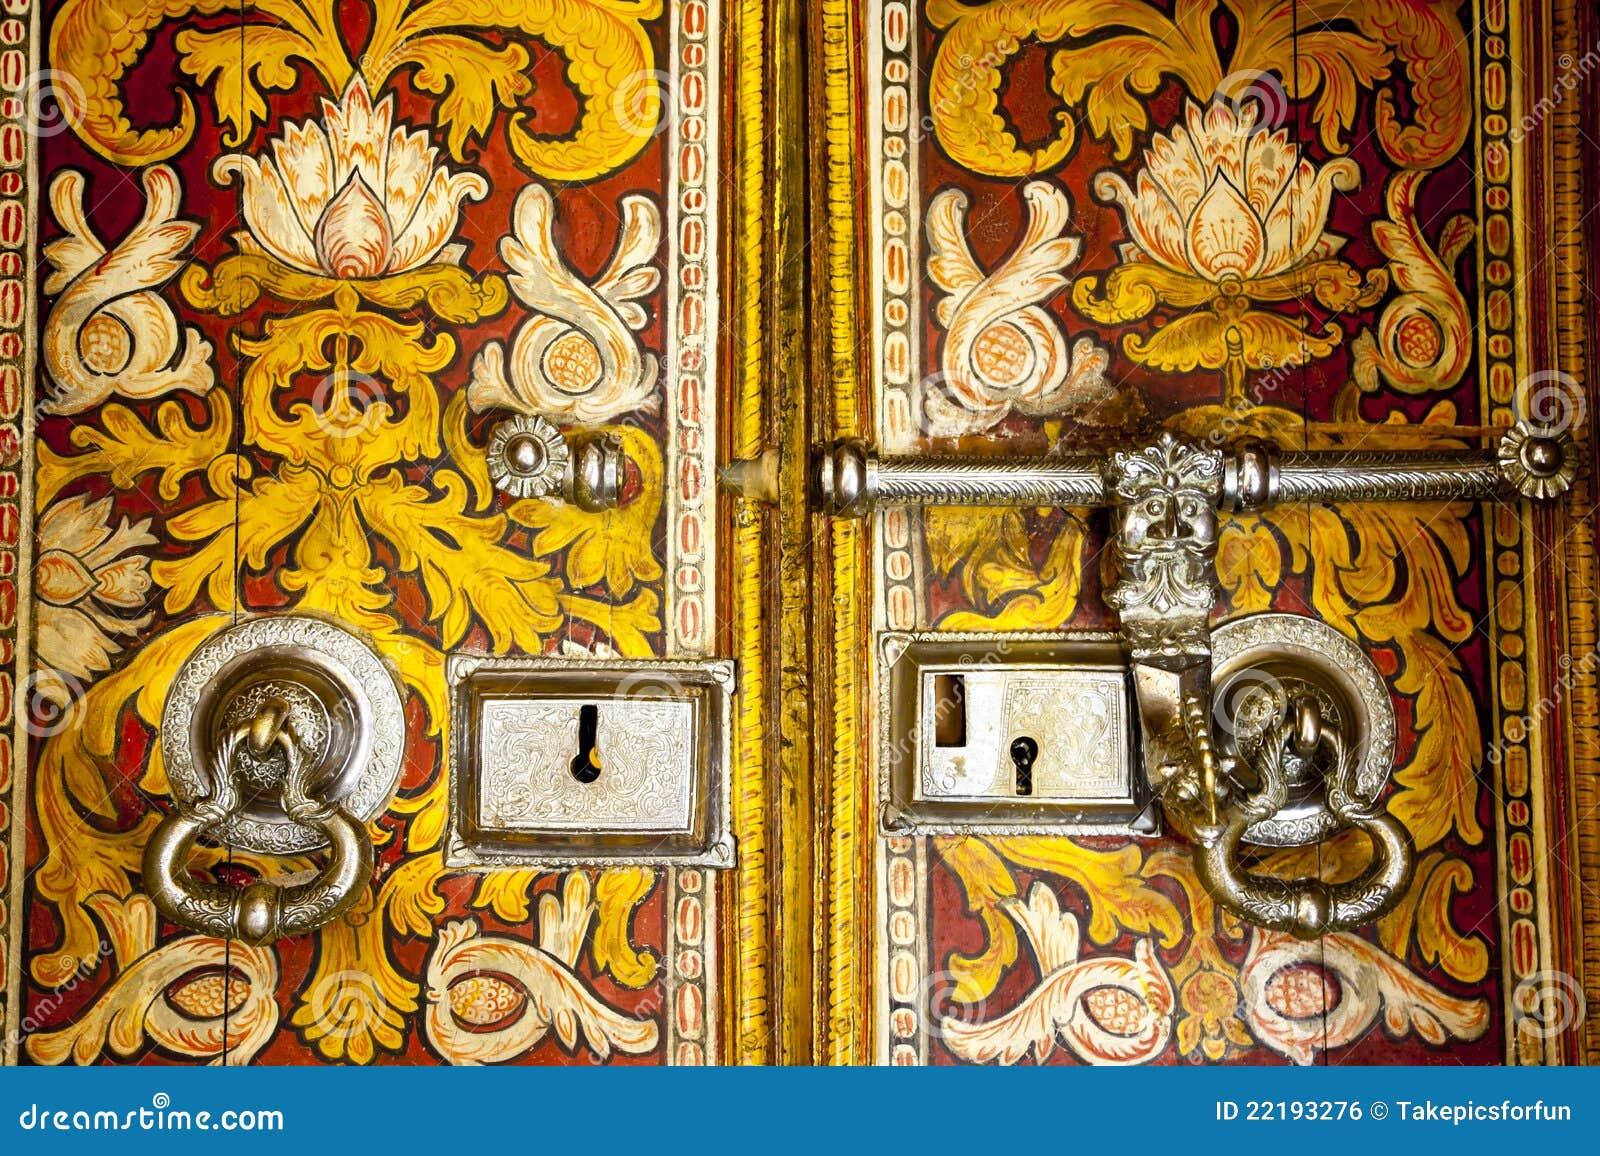 Old Buddhist Temple Door In Sri Lanka Royalty Free Stock